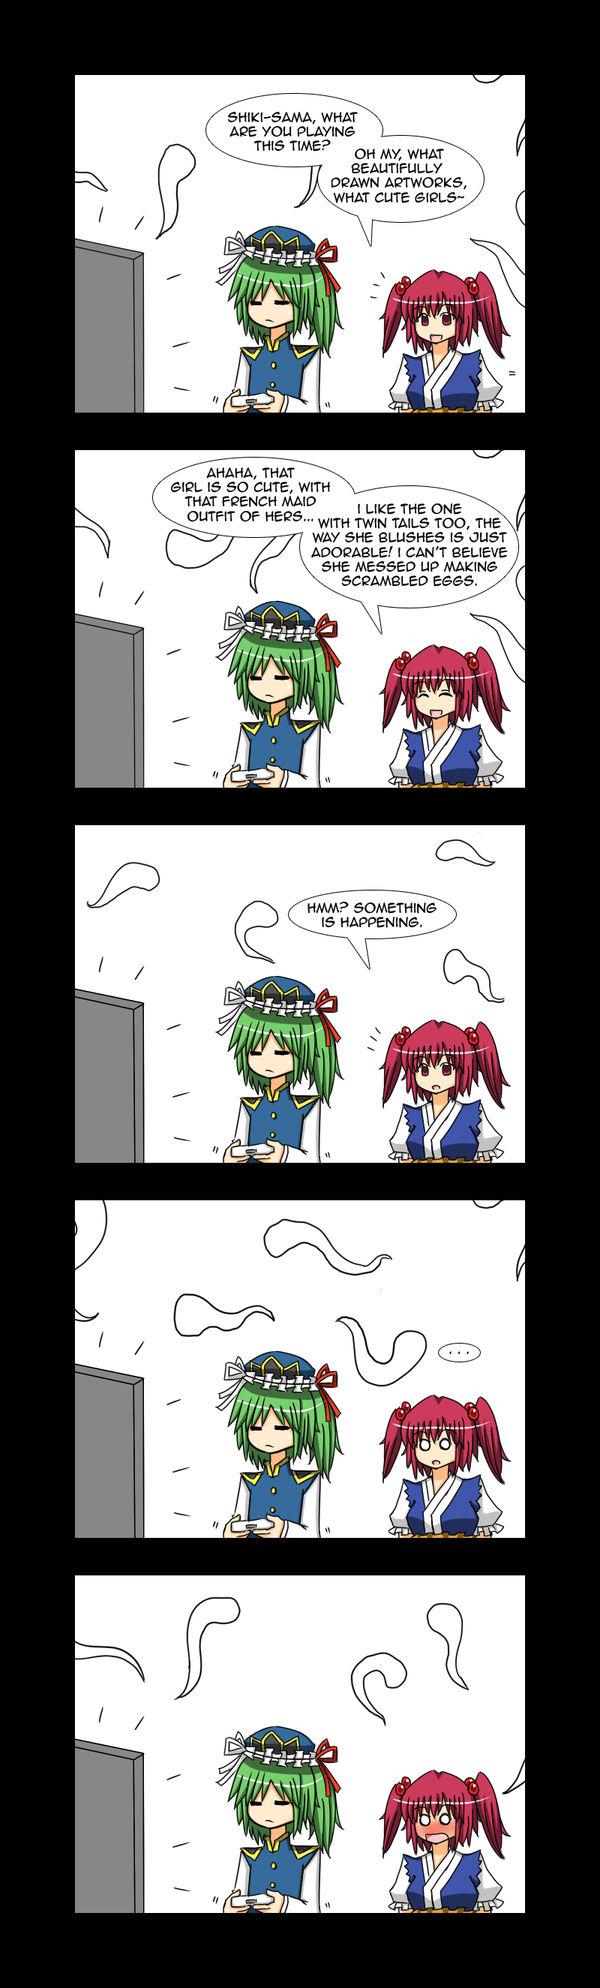 Shikieiki is a Fangirl 7